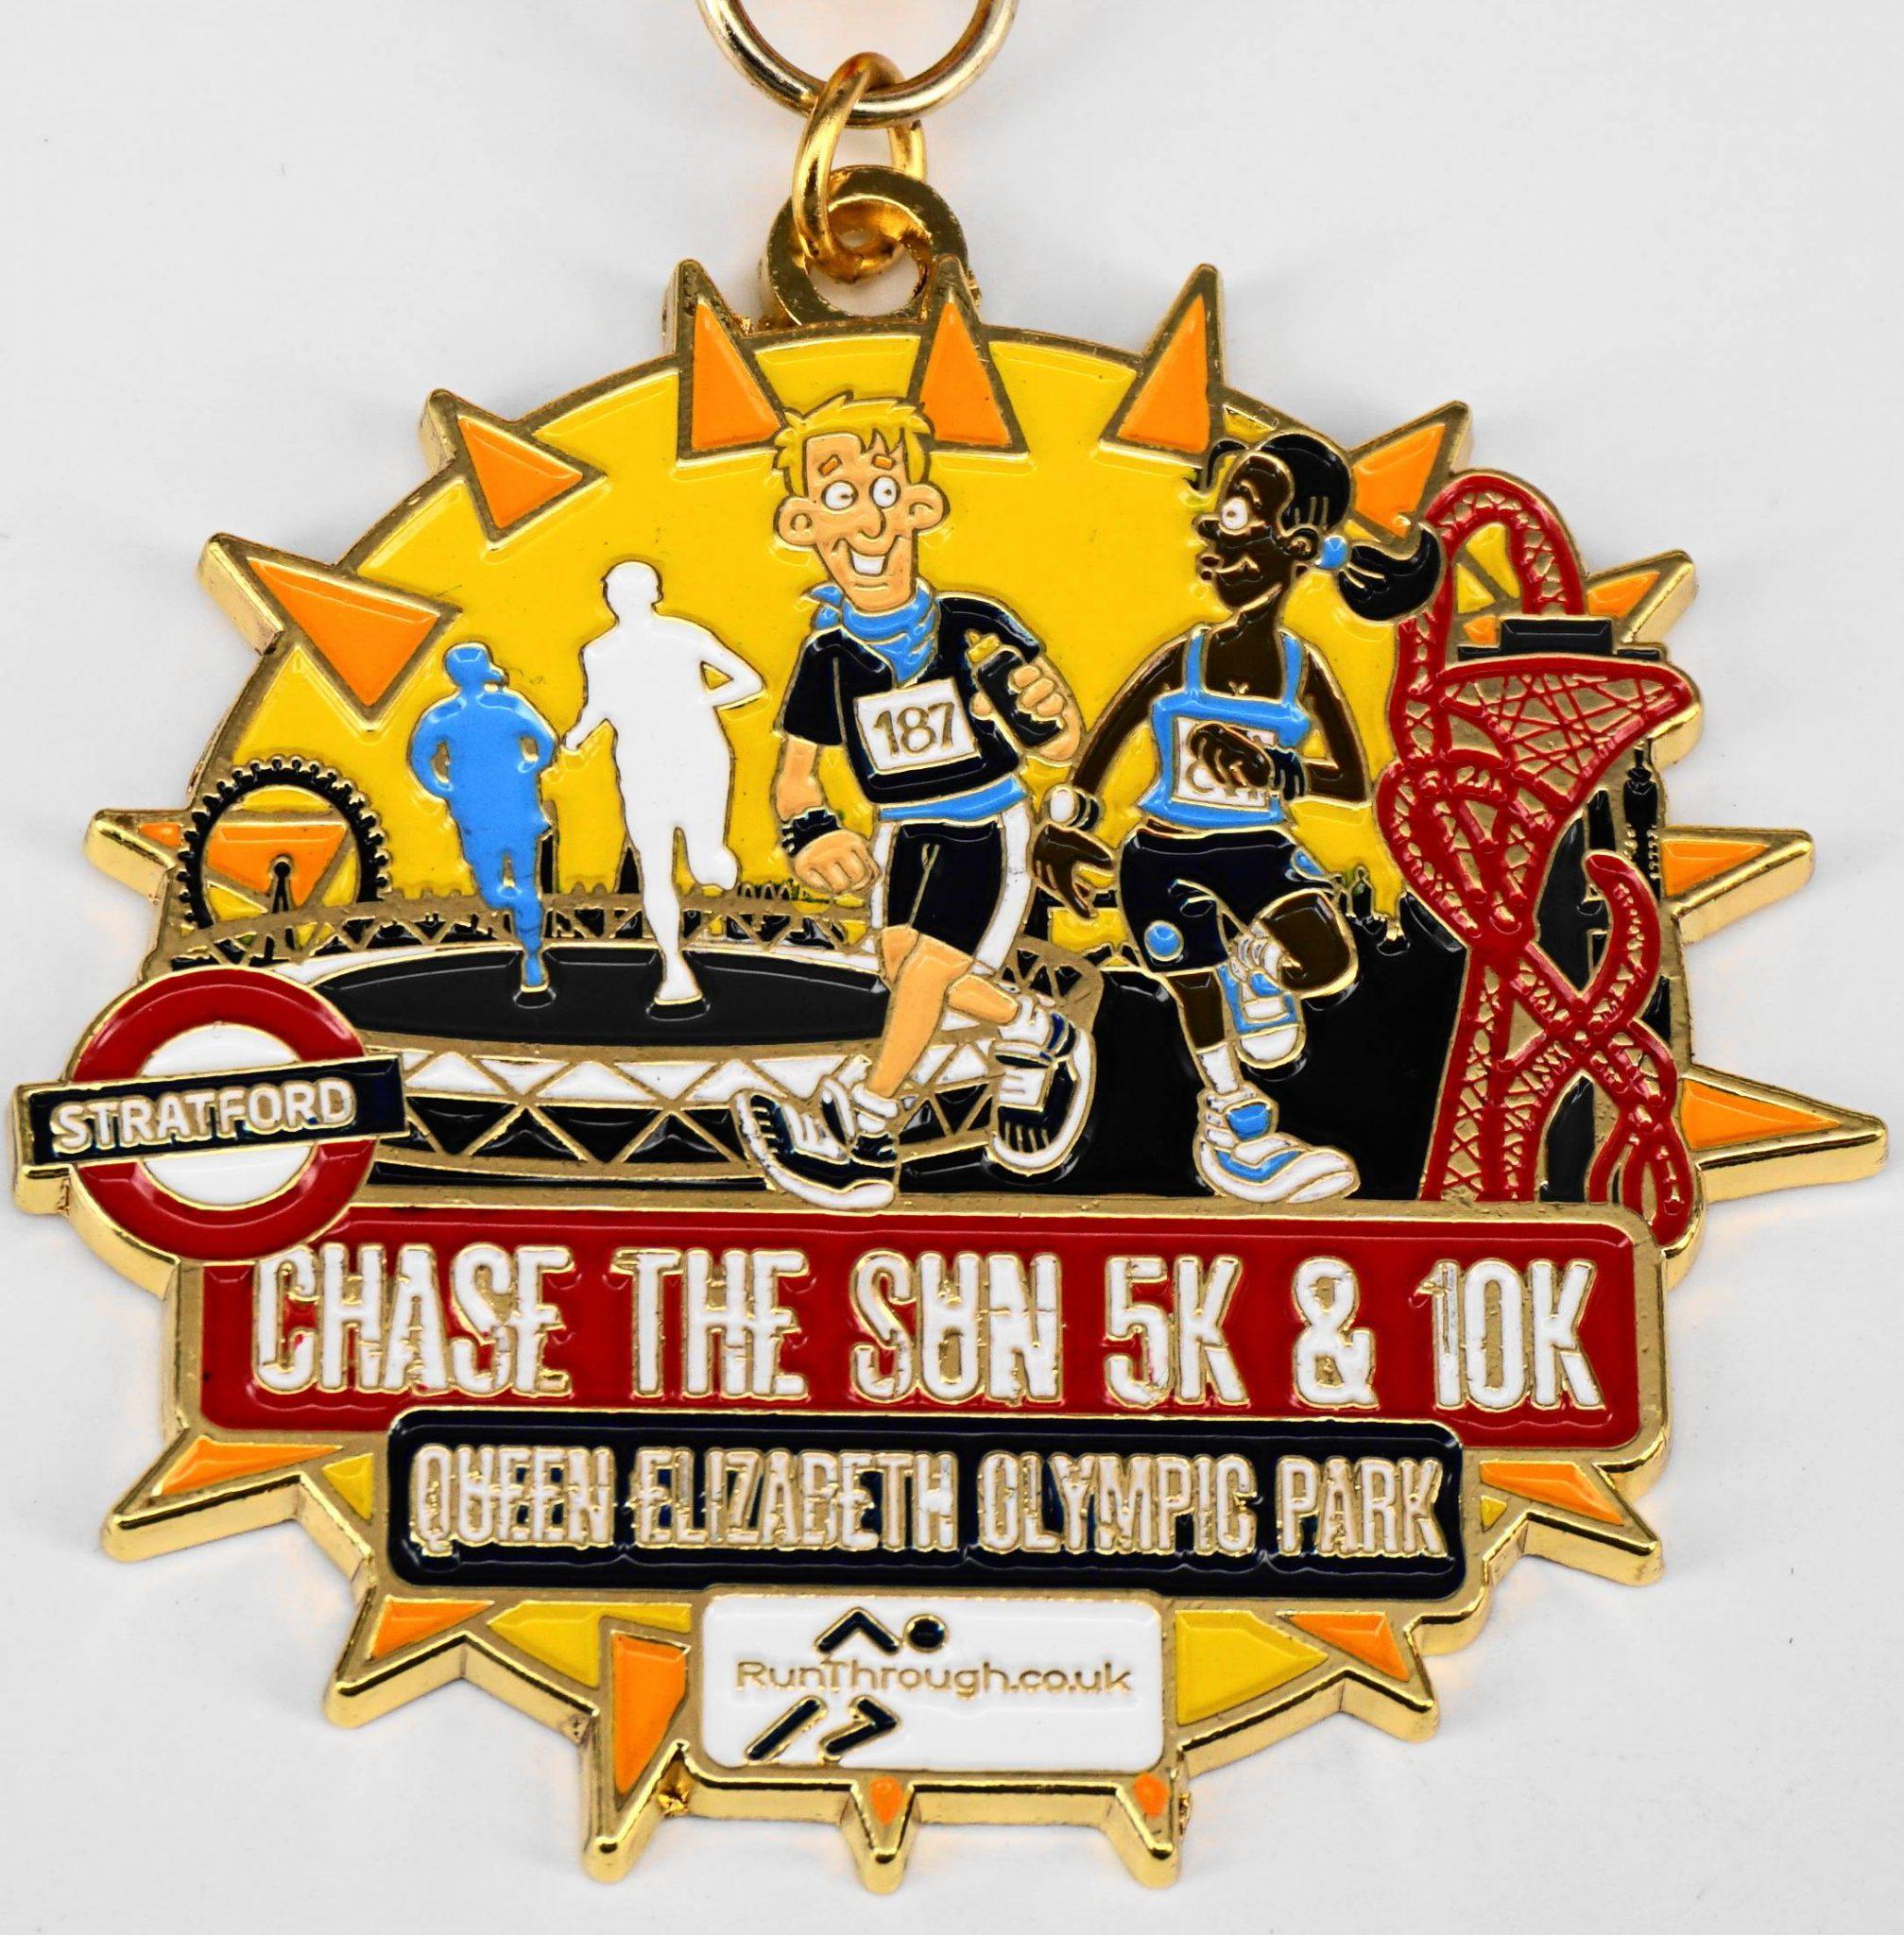 Chase The Sun Queen Elizabeth Olympic Park 5k 10k June 2018